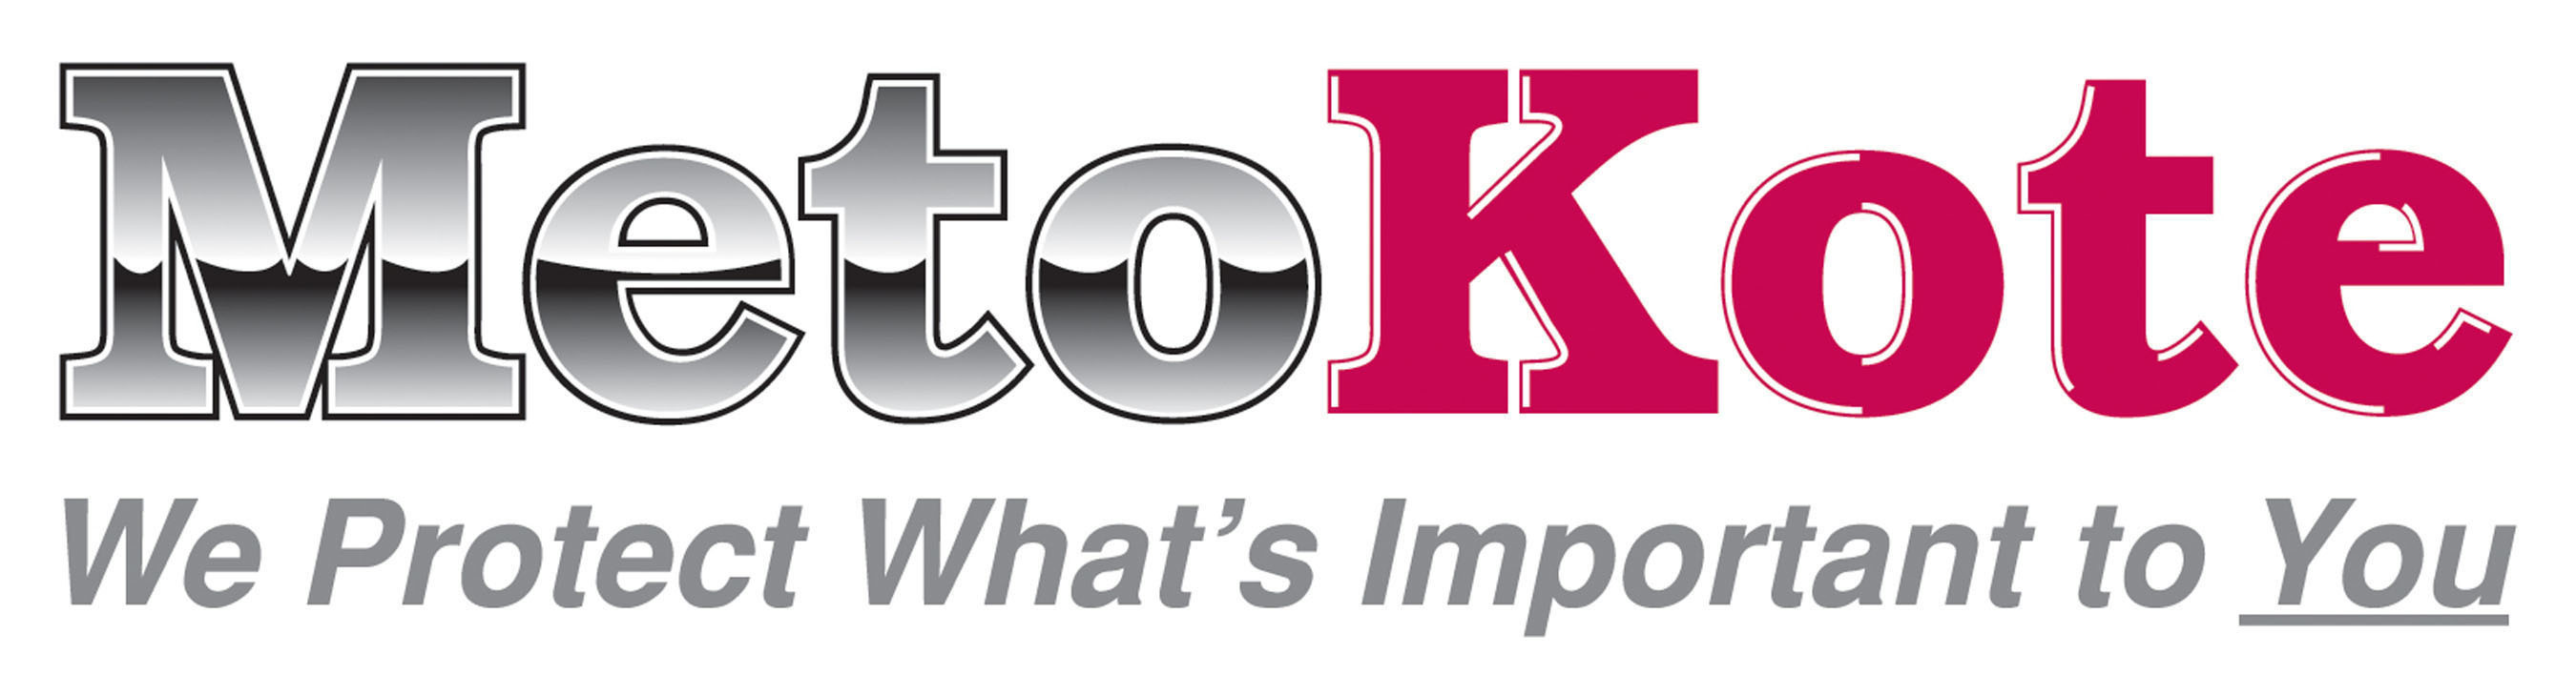 MetoKote Corporation logo. (PRNewsFoto/MetoKote Corporation) (PRNewsFoto/)